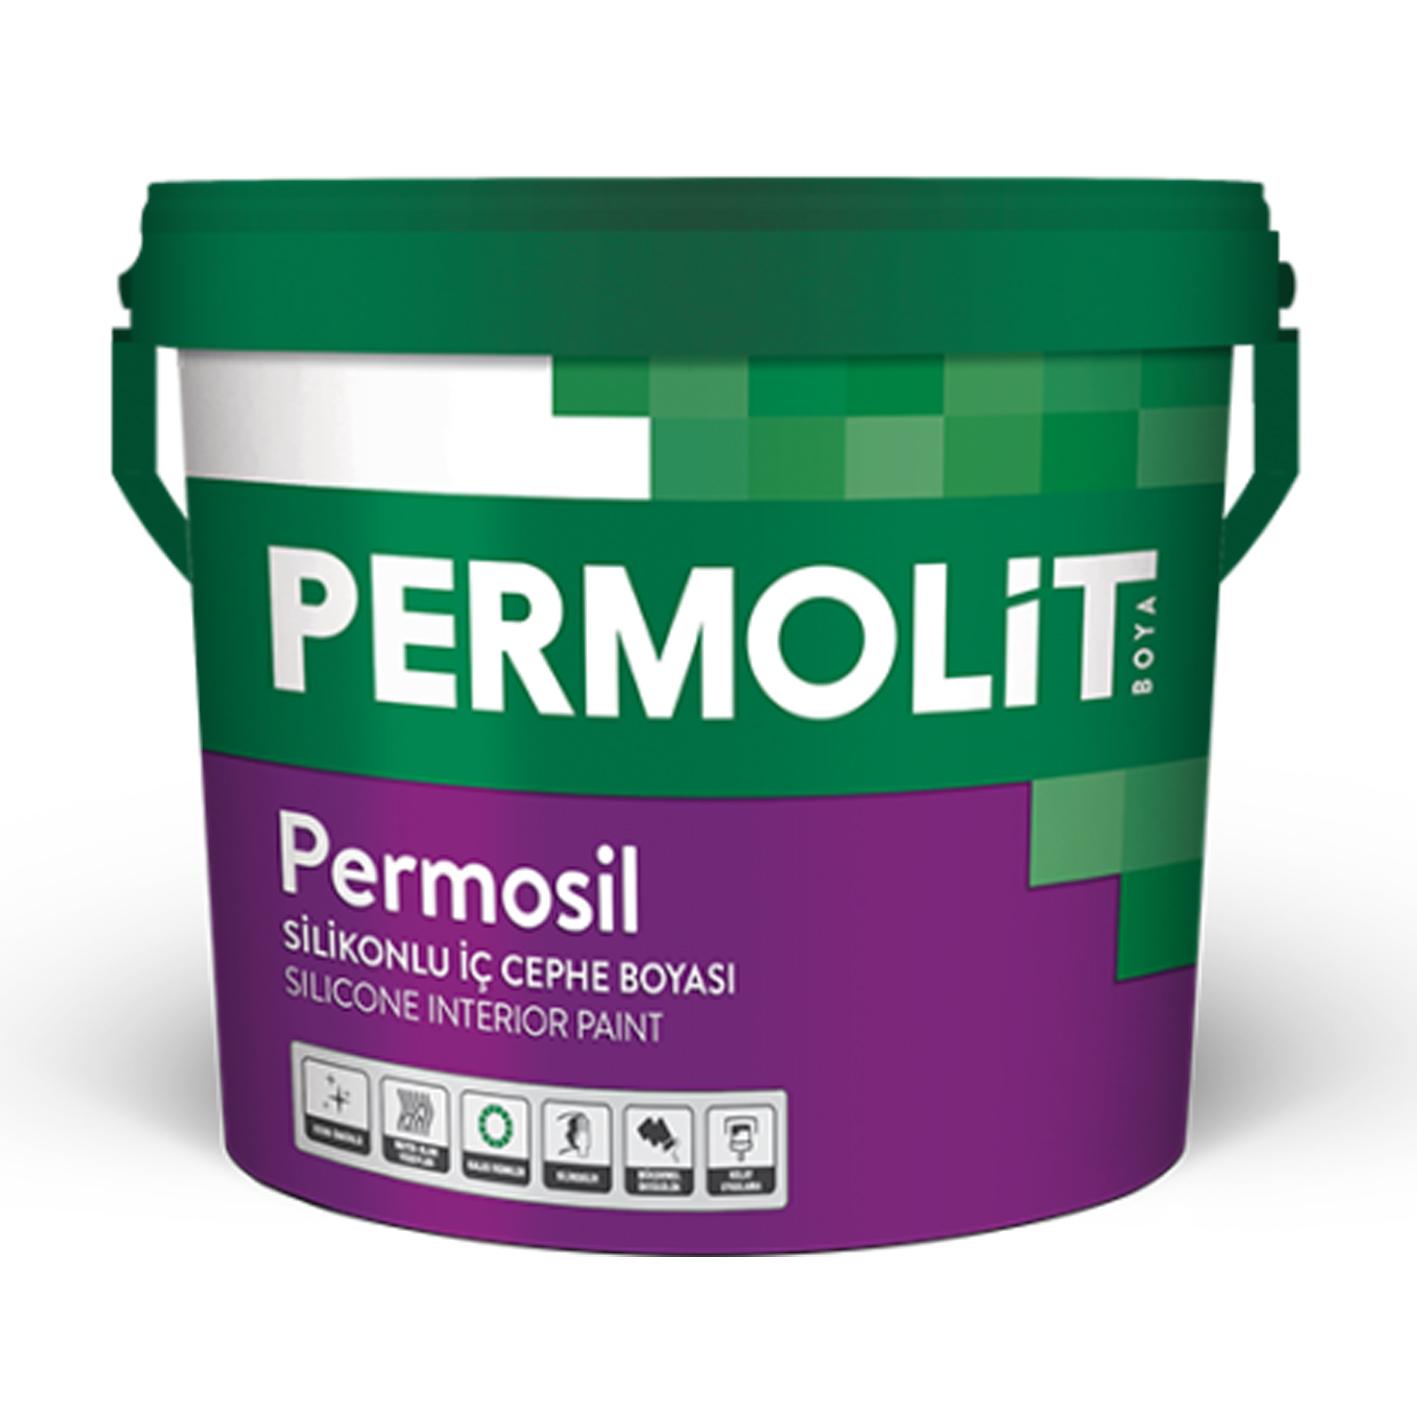 Permolit Permosil İç Cephe Beyaz Baz 20Kg